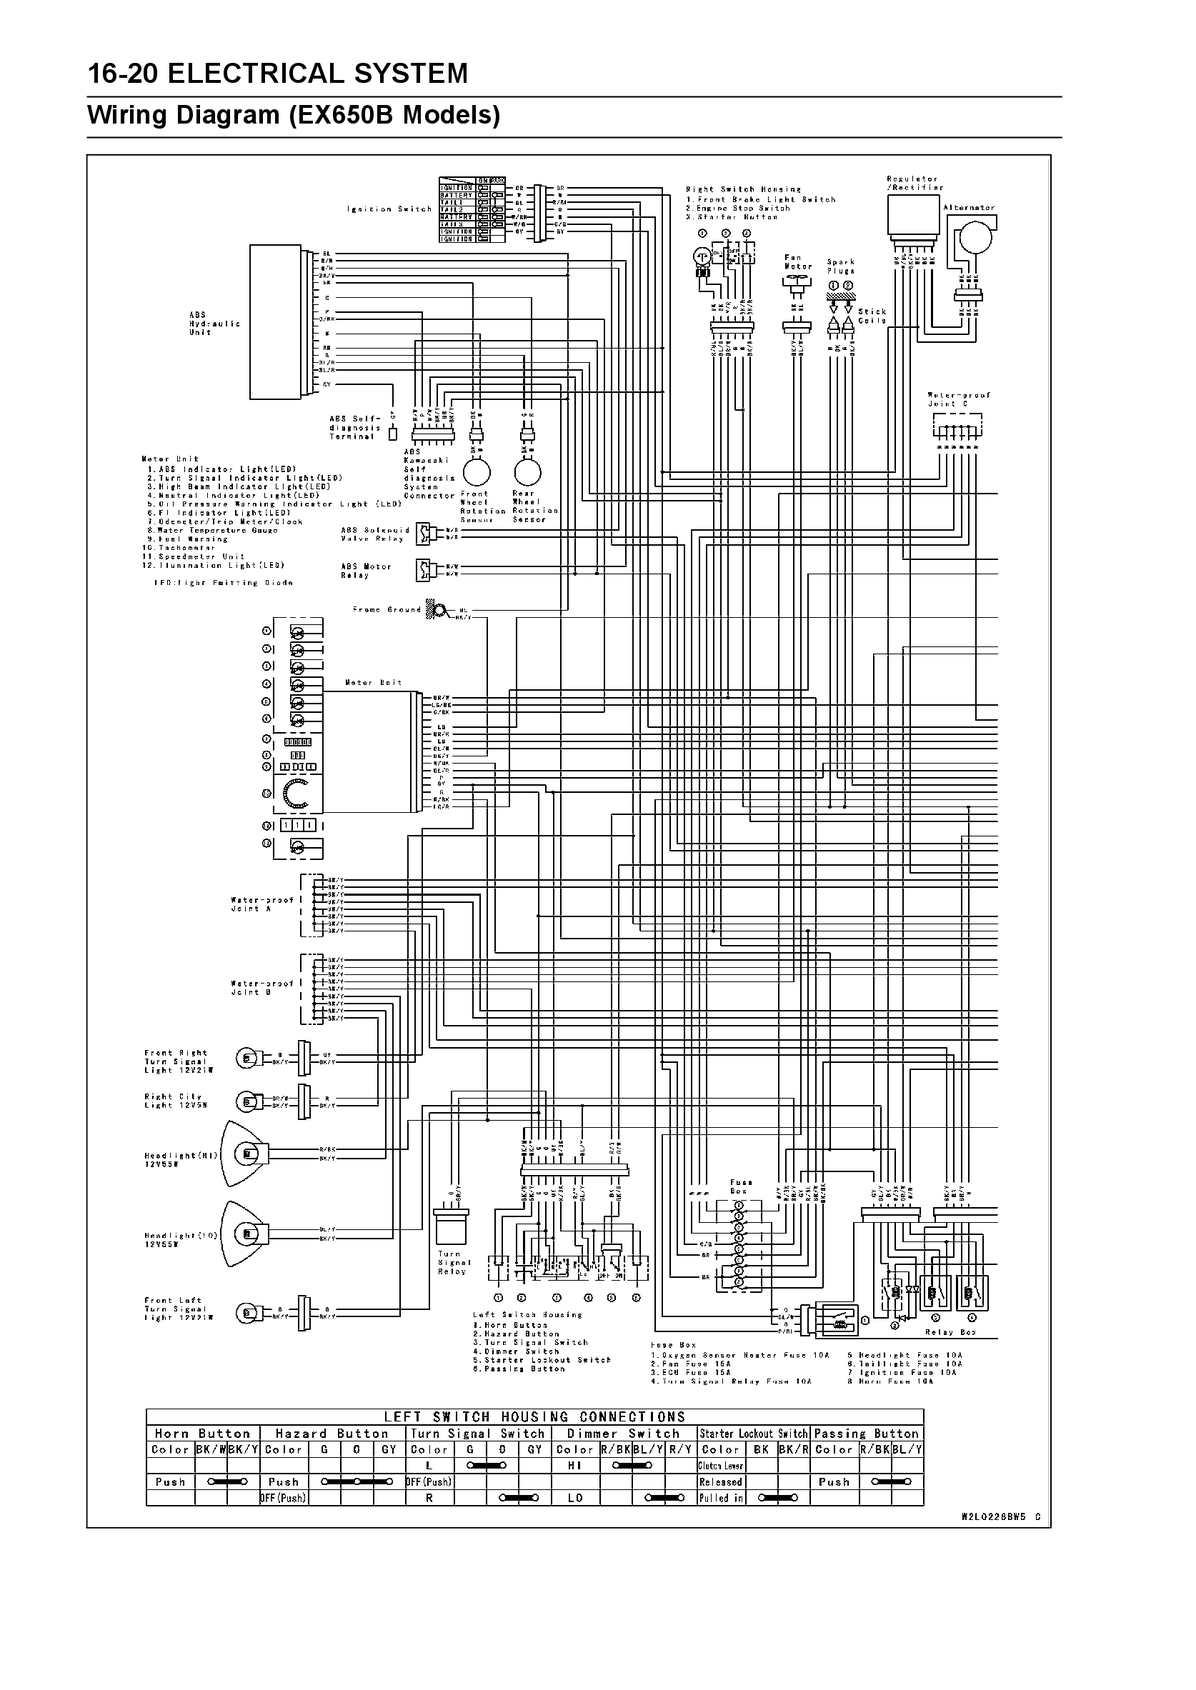 2008 Zx10r Headlight Wiring Diagram Images Of Home Design Speed Triple Kawasaki Ninja 650r Harness Triumph